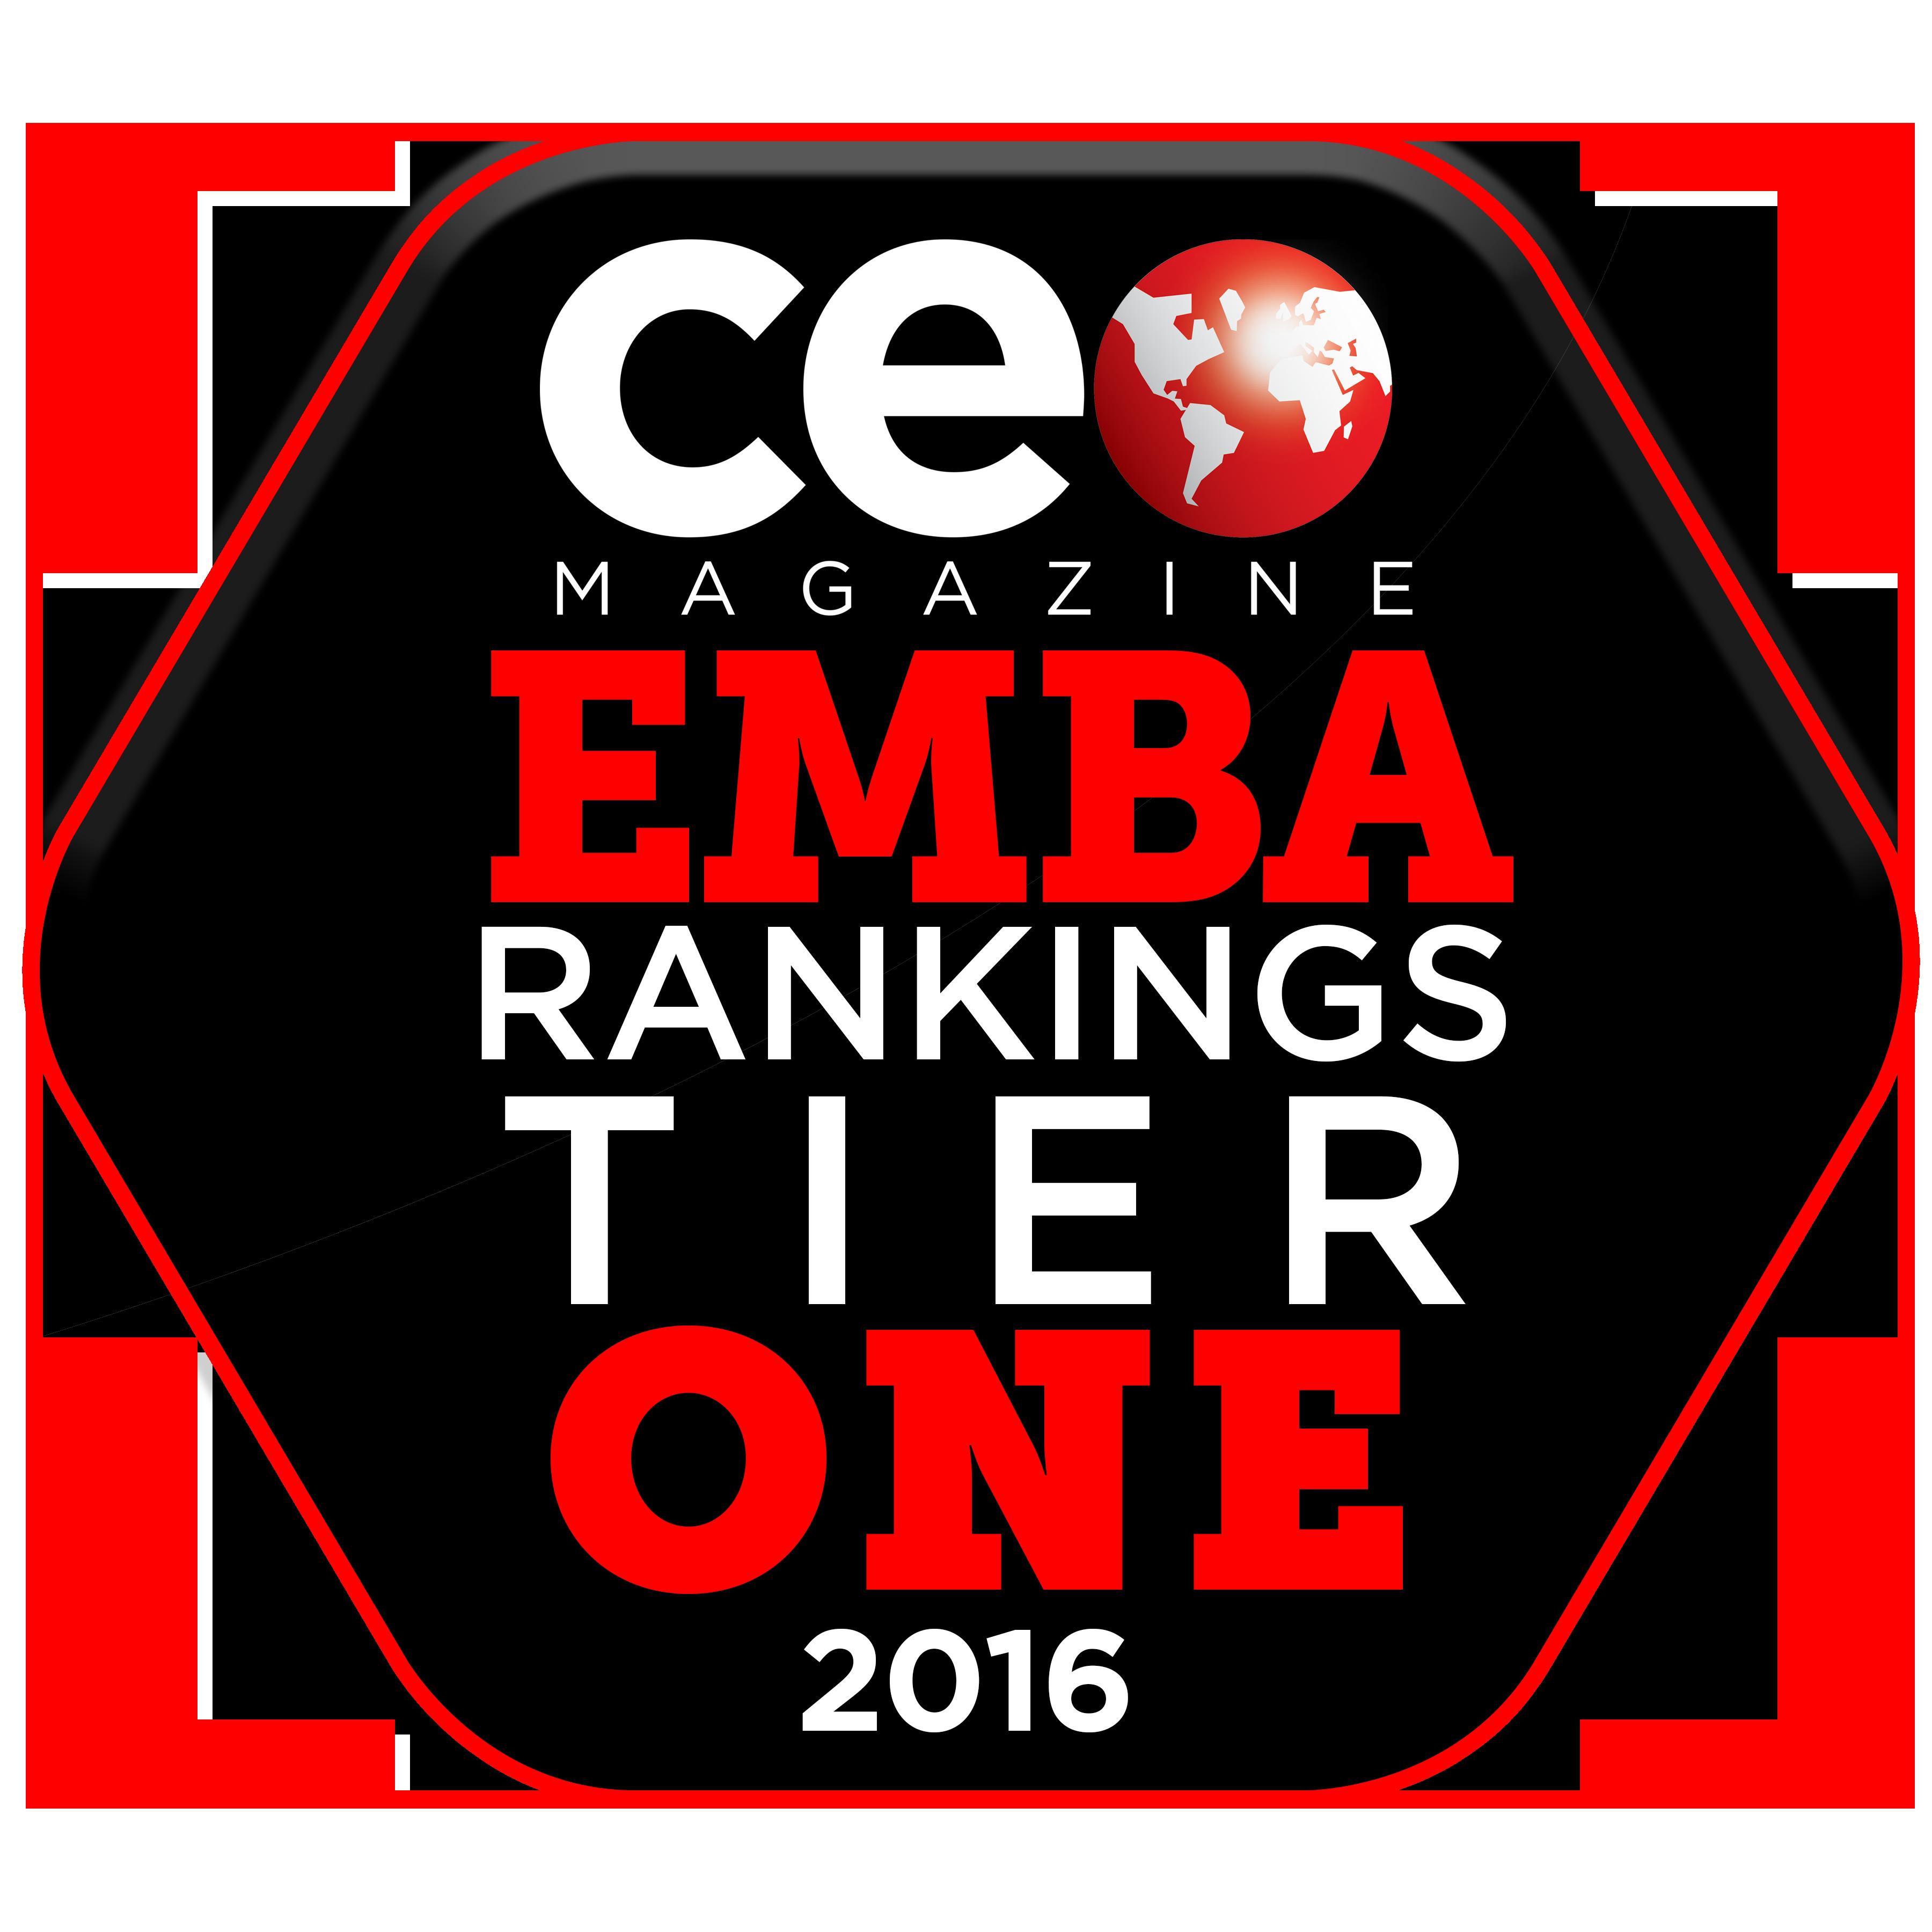 Image of CEO Magazine EMBA Rankings badge